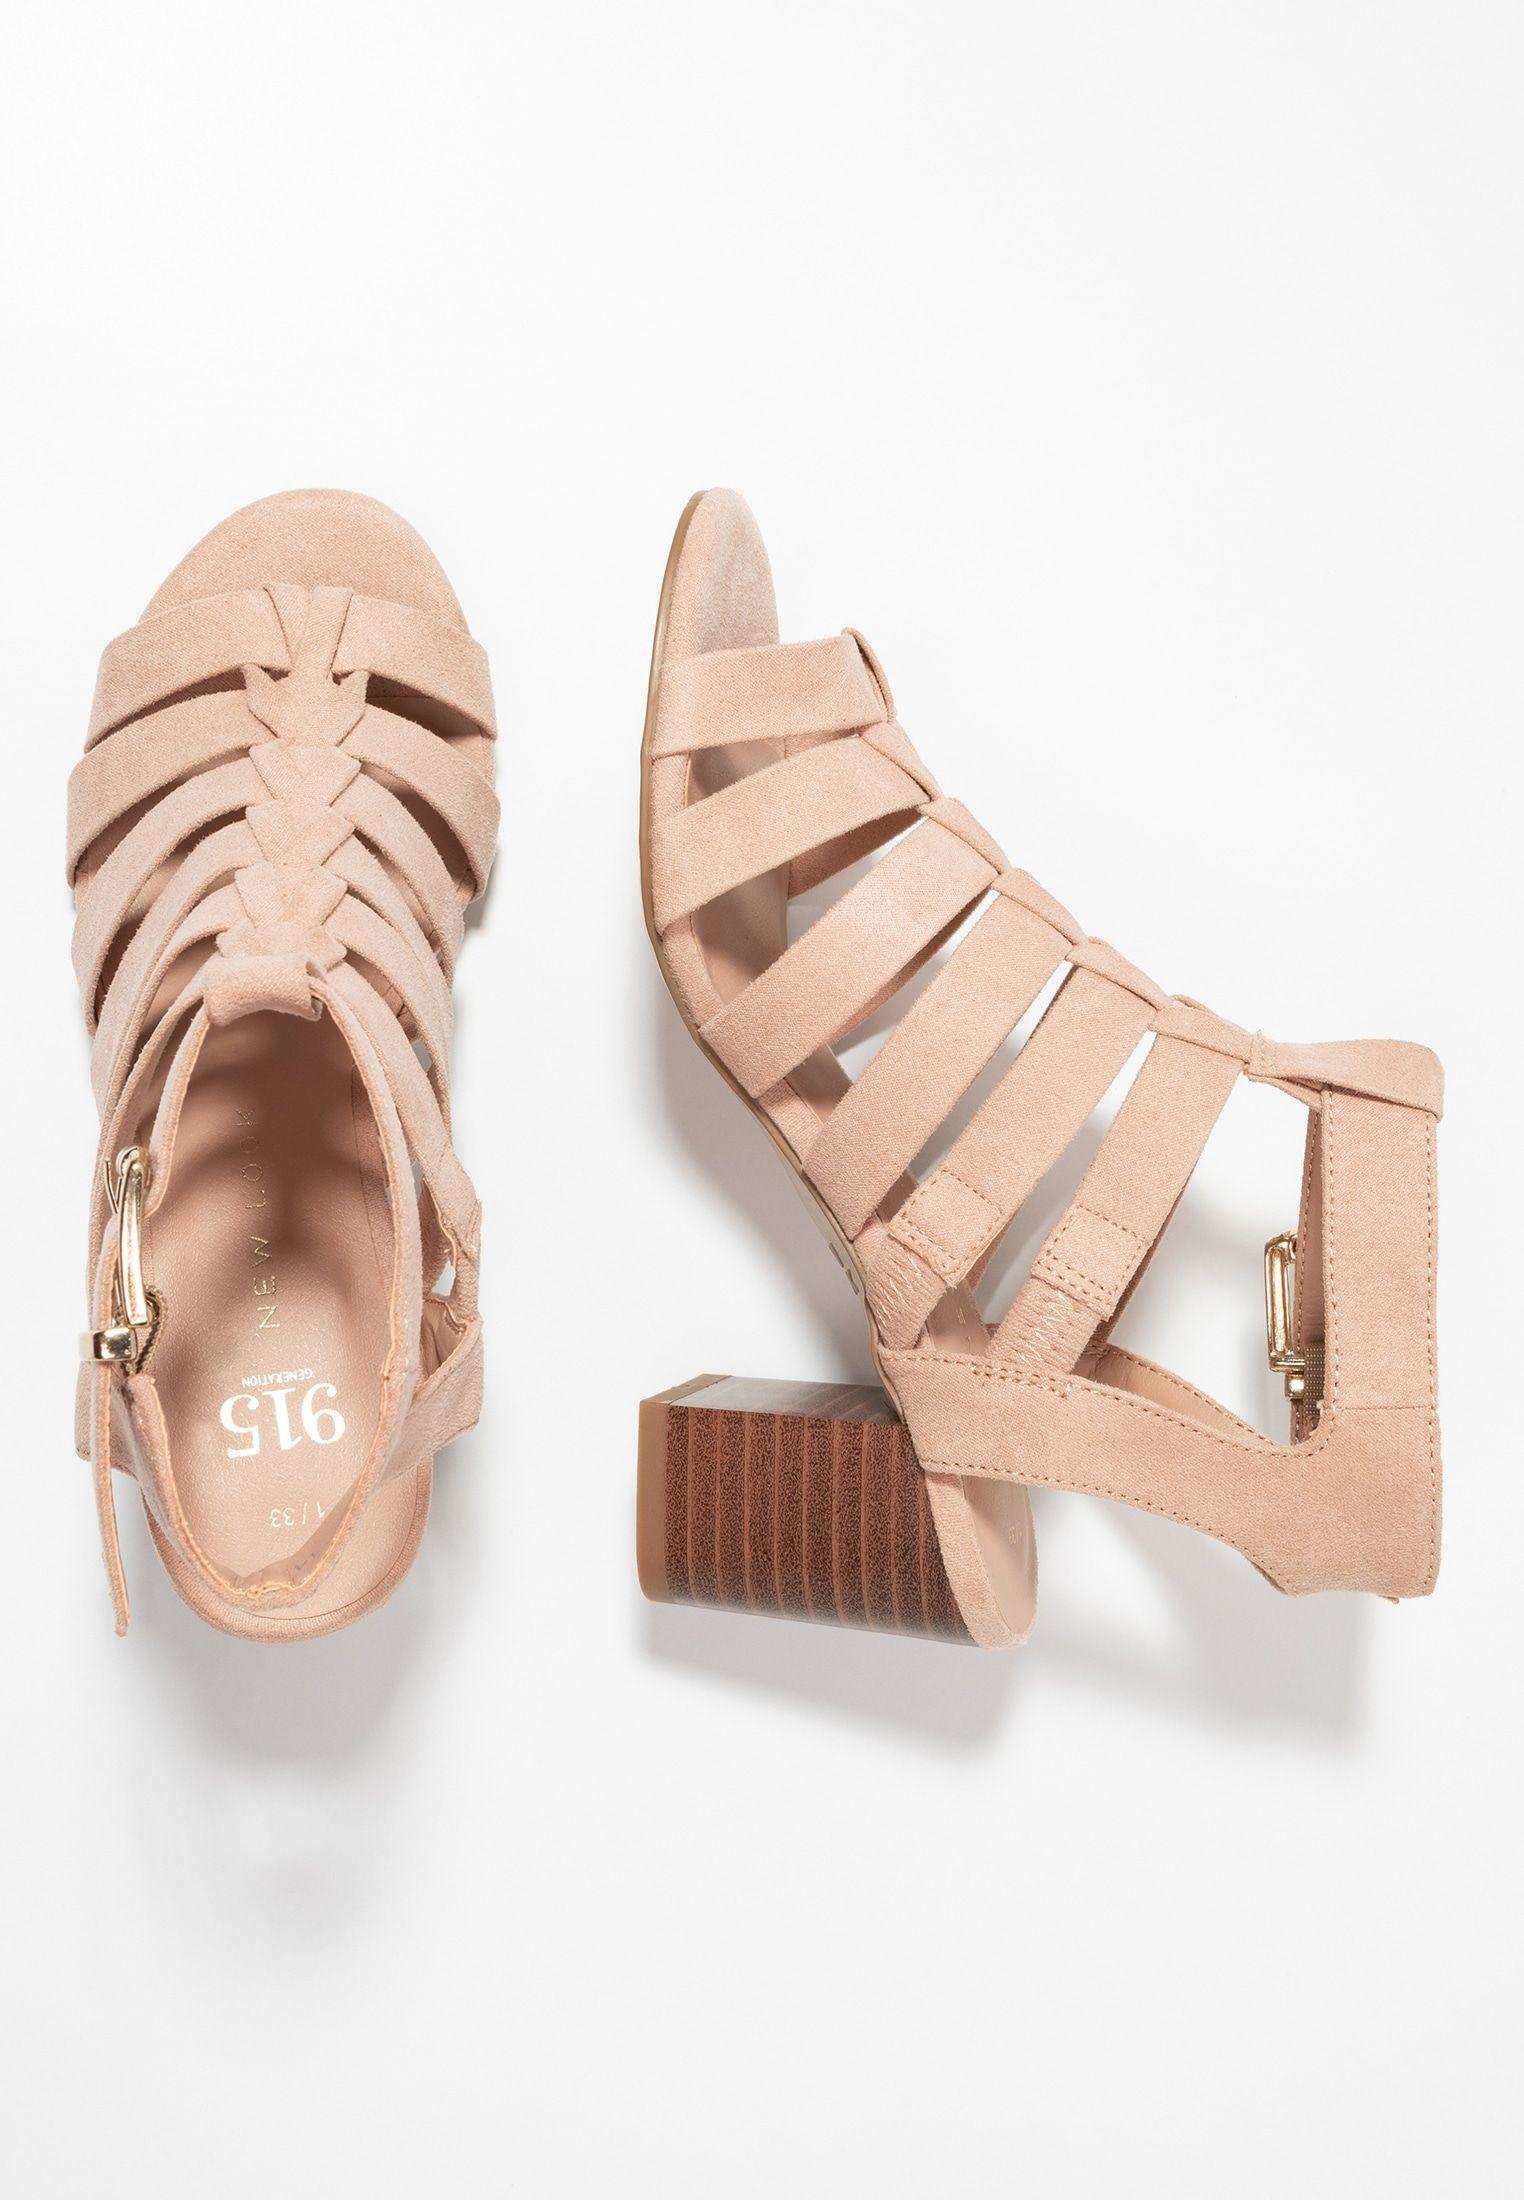 24b9603c1e New Look 915 Generation OLIVIA - Strappy Sandals - oatmeal - Zalando.de